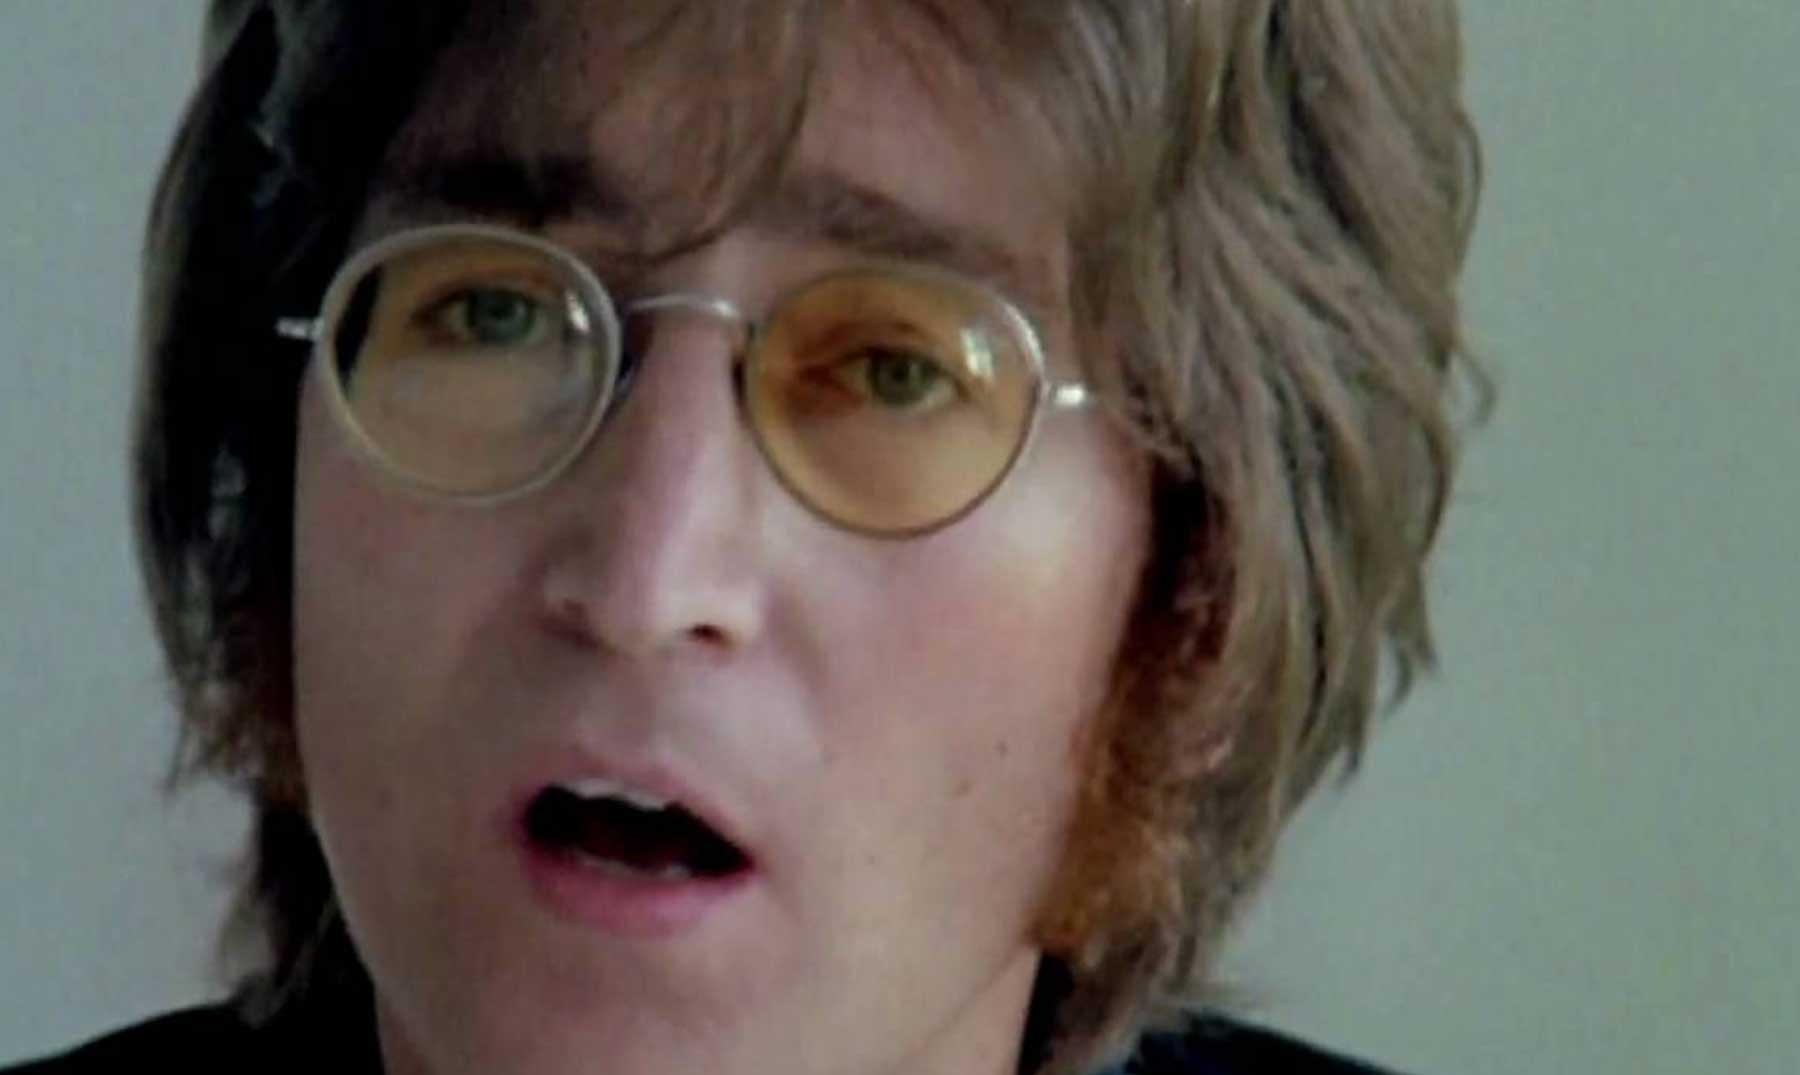 Frases de John Lennon para el recuerdo